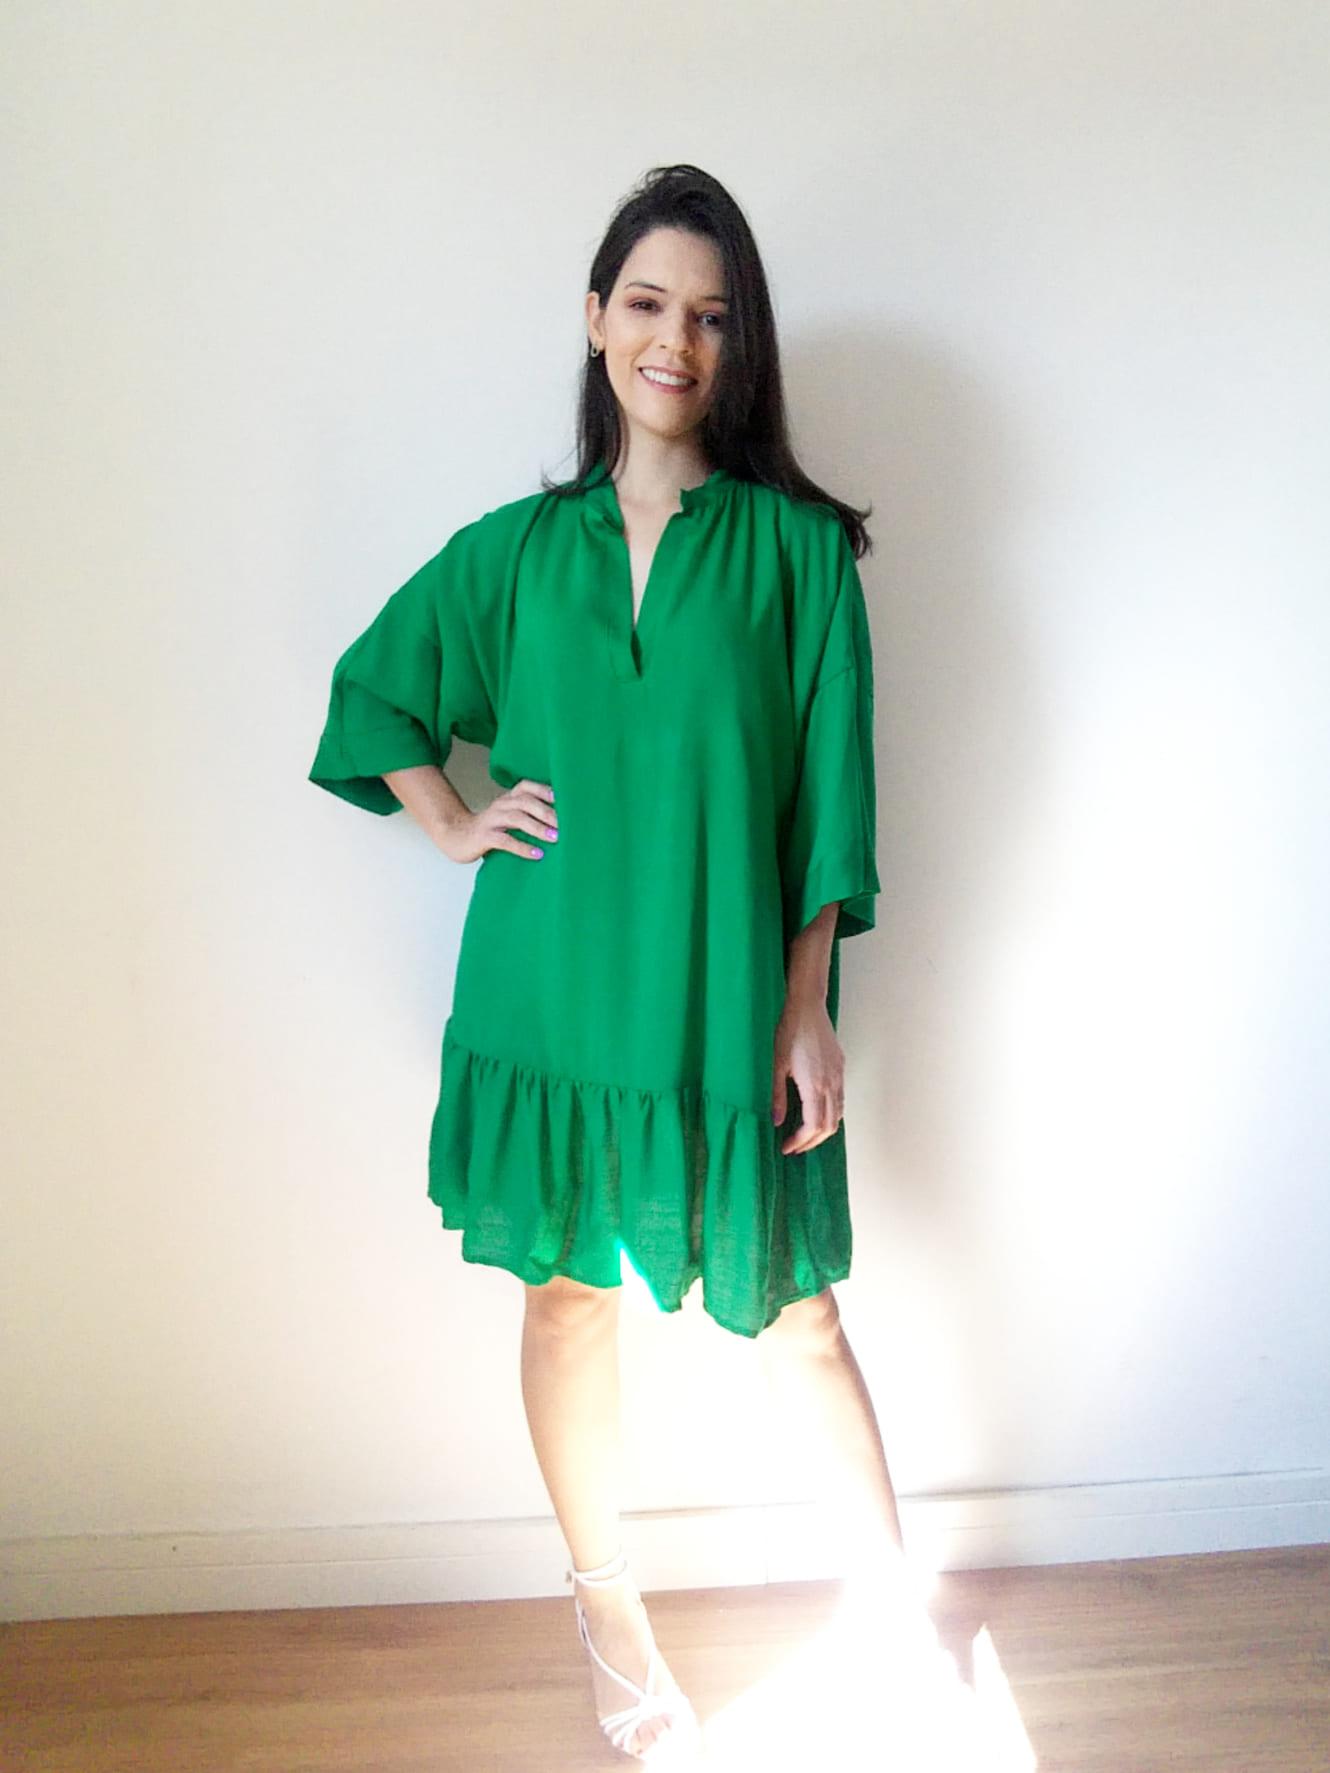 Vestido verde veste até 46